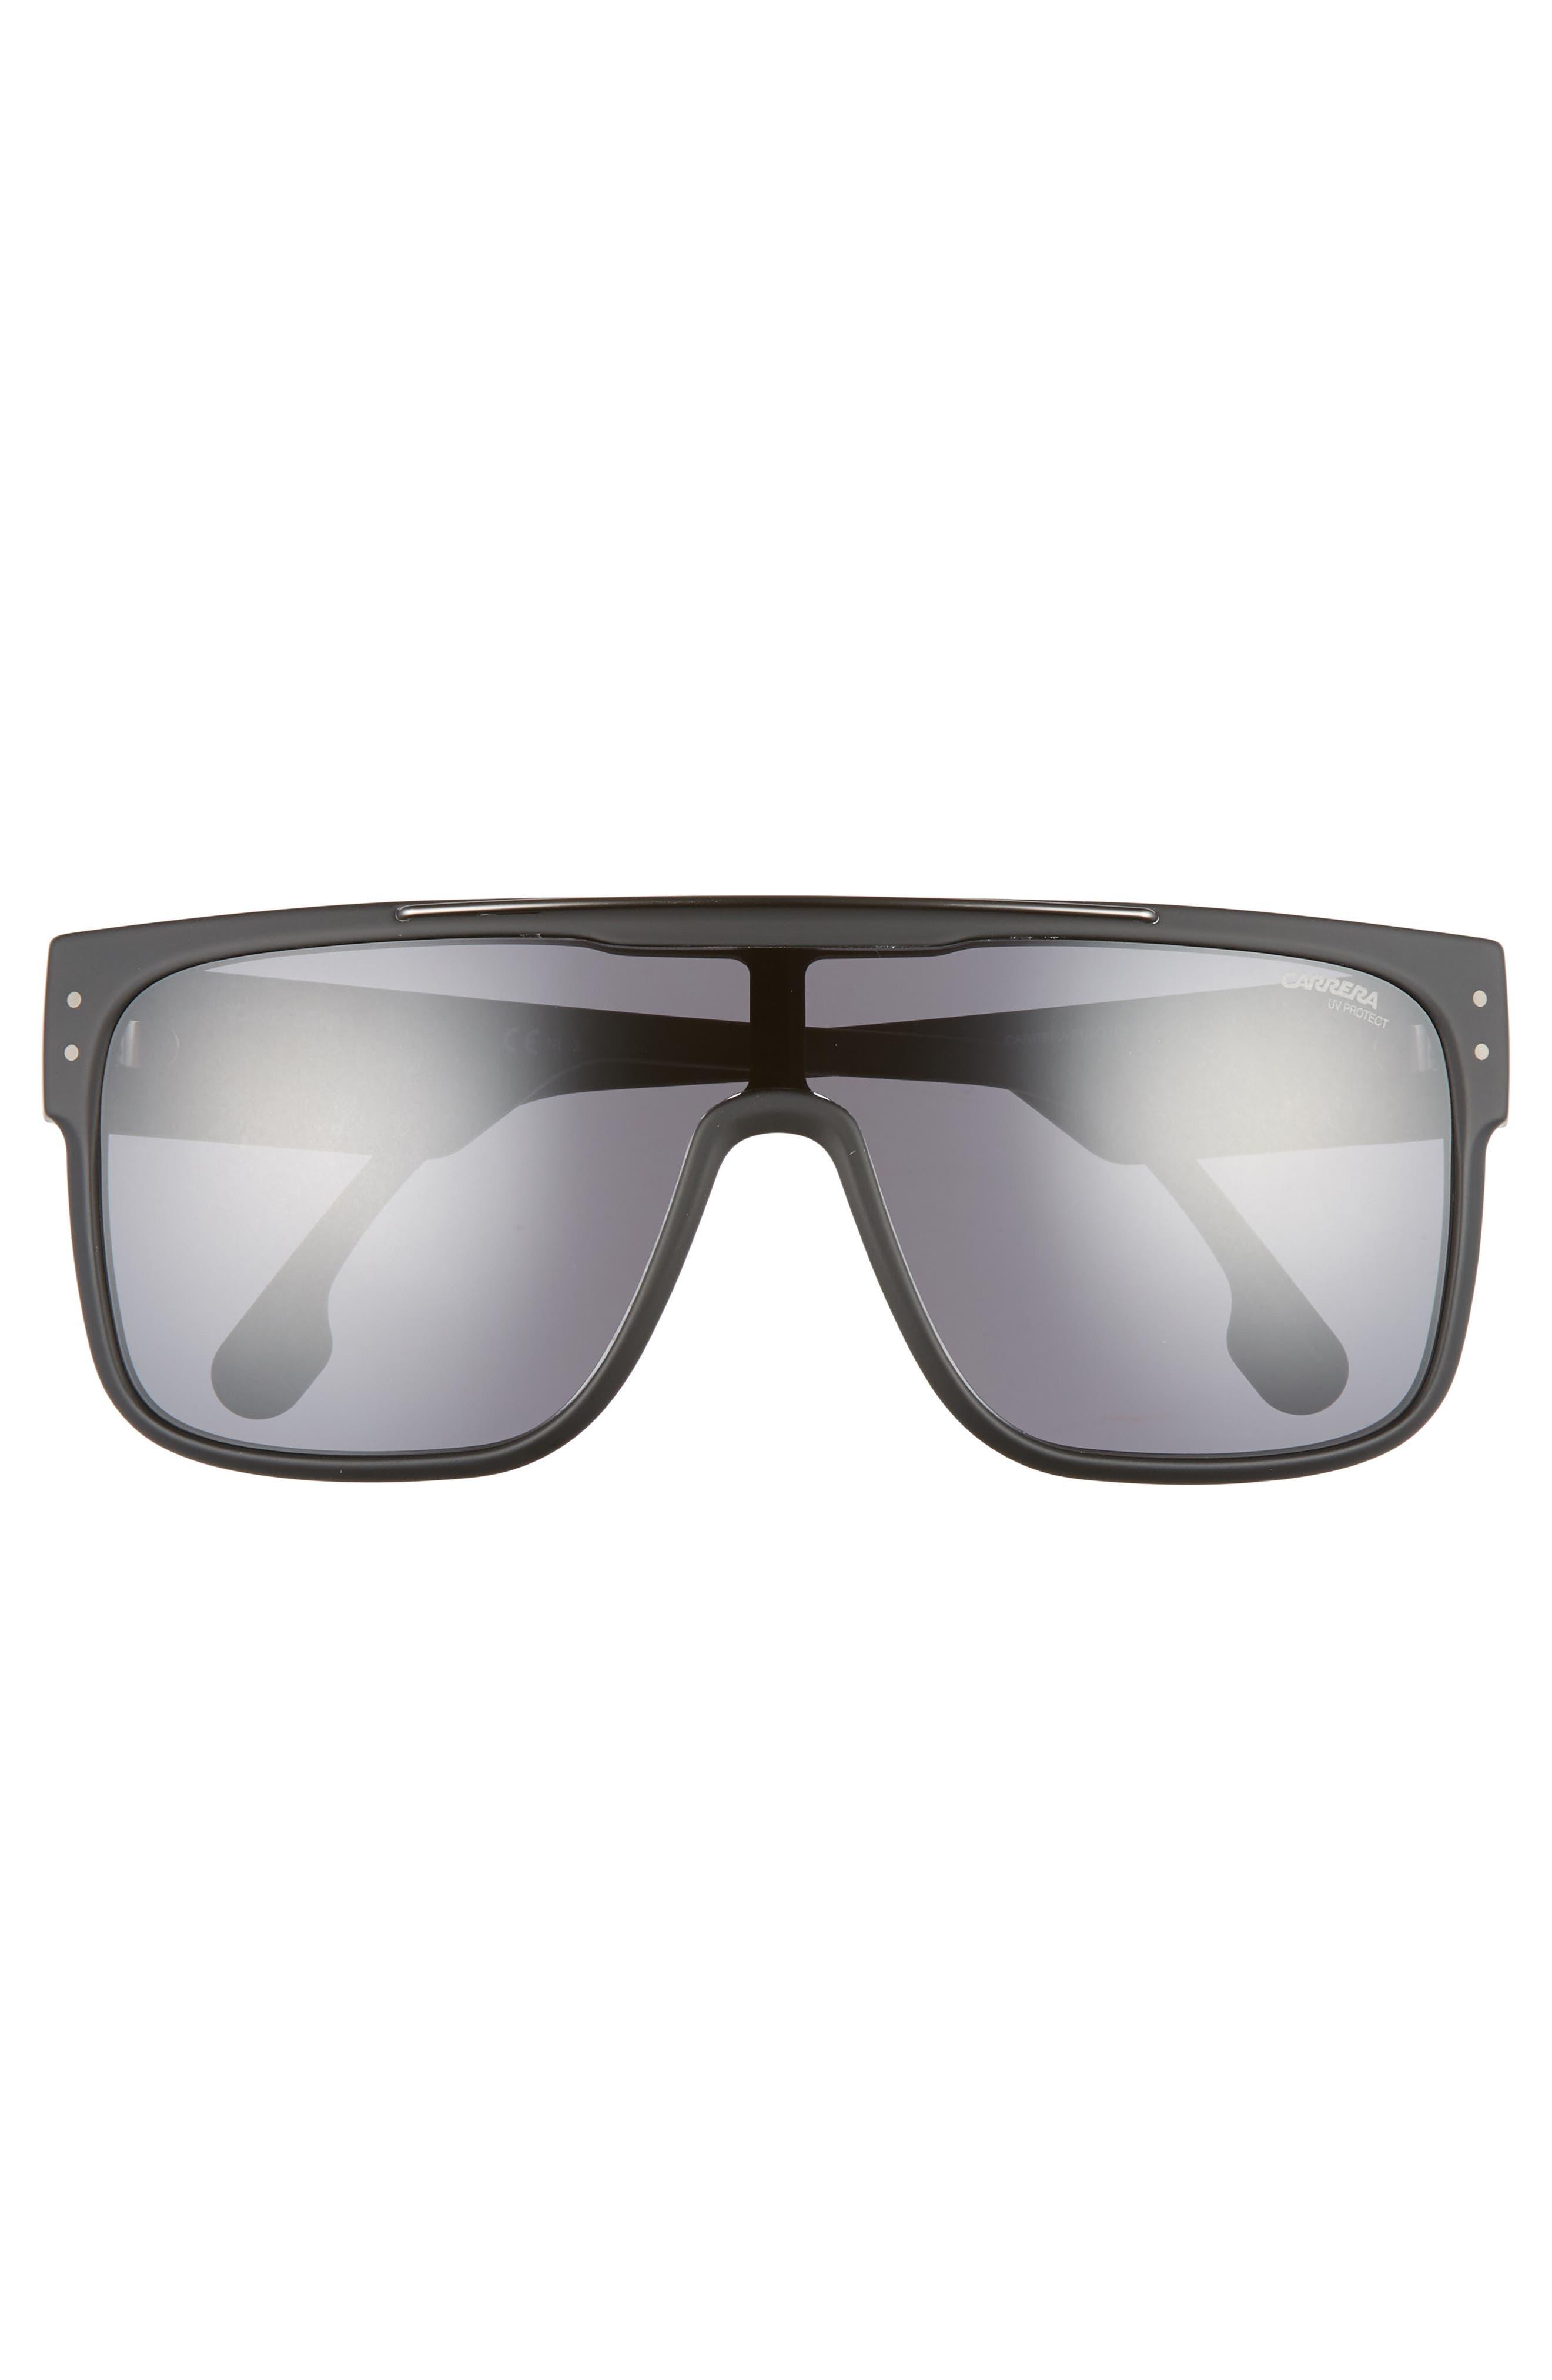 Flagstop II 140mm Flat Top Sunglasses,                             Alternate thumbnail 2, color,                             MATTE BLACK